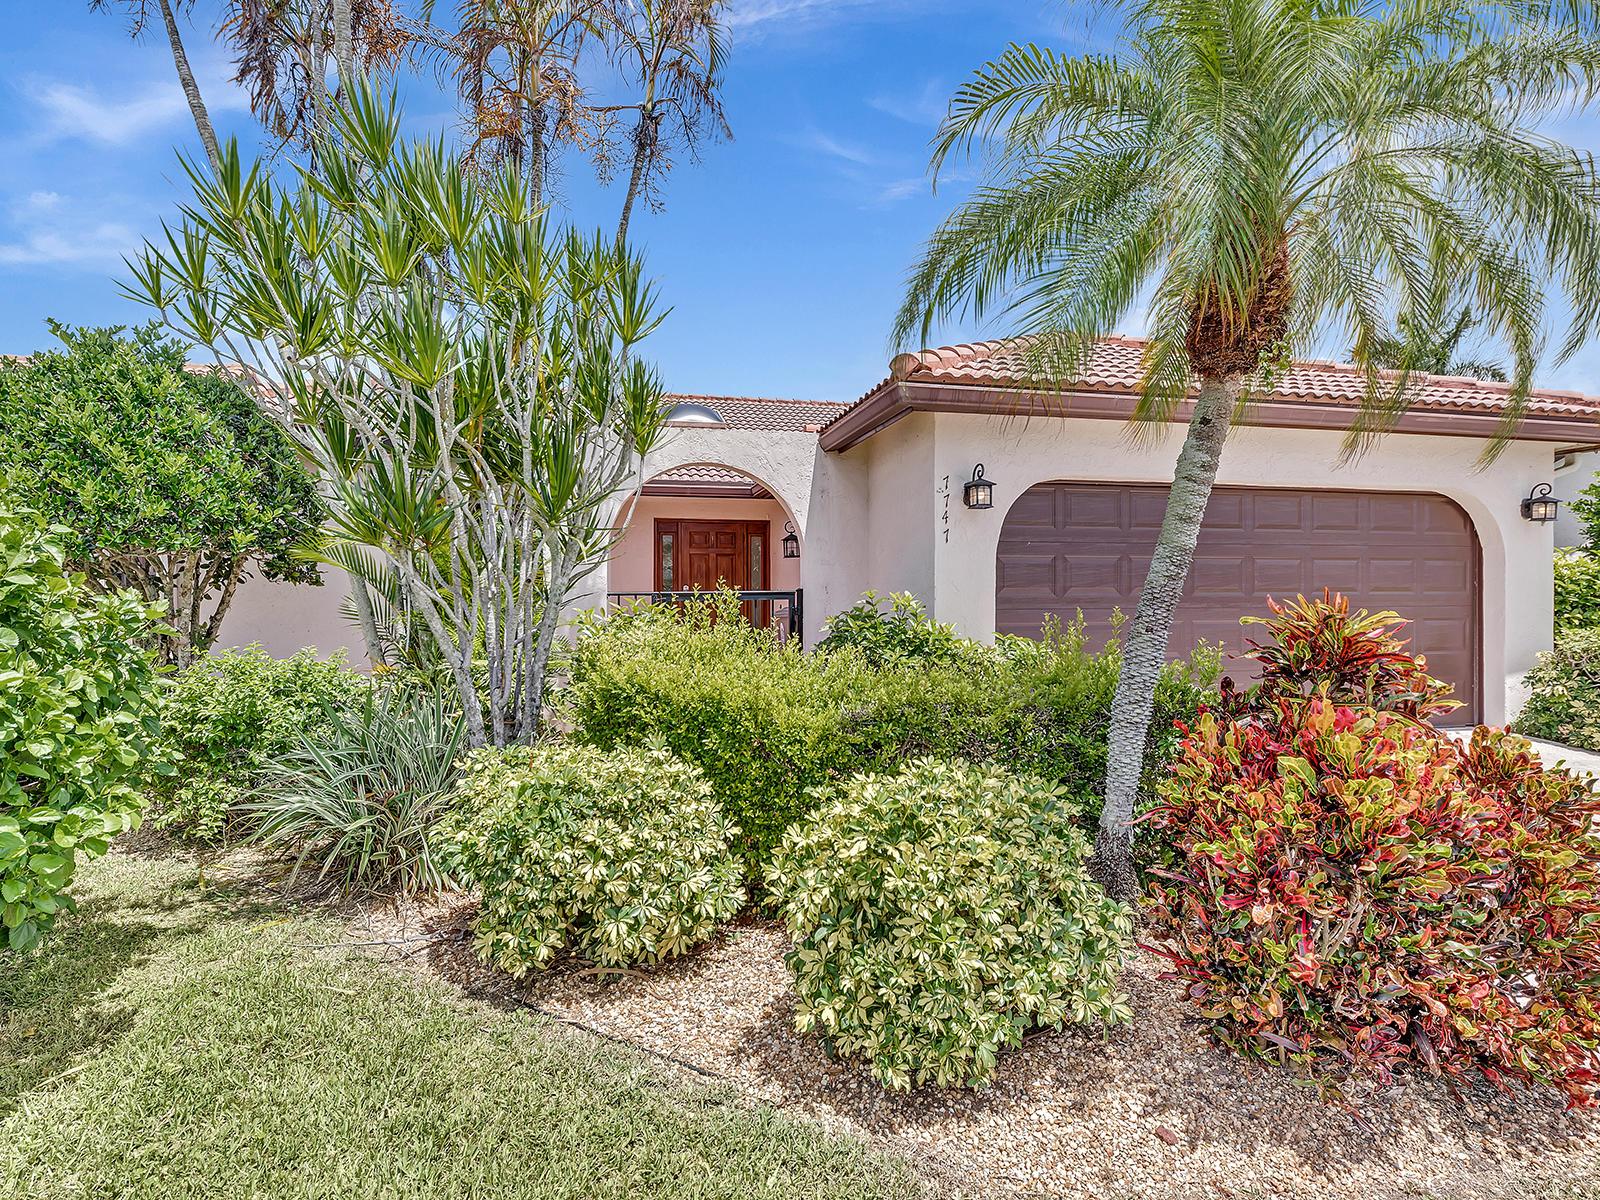 7747 Villa Nova Drive, Boca Raton, FL 33433